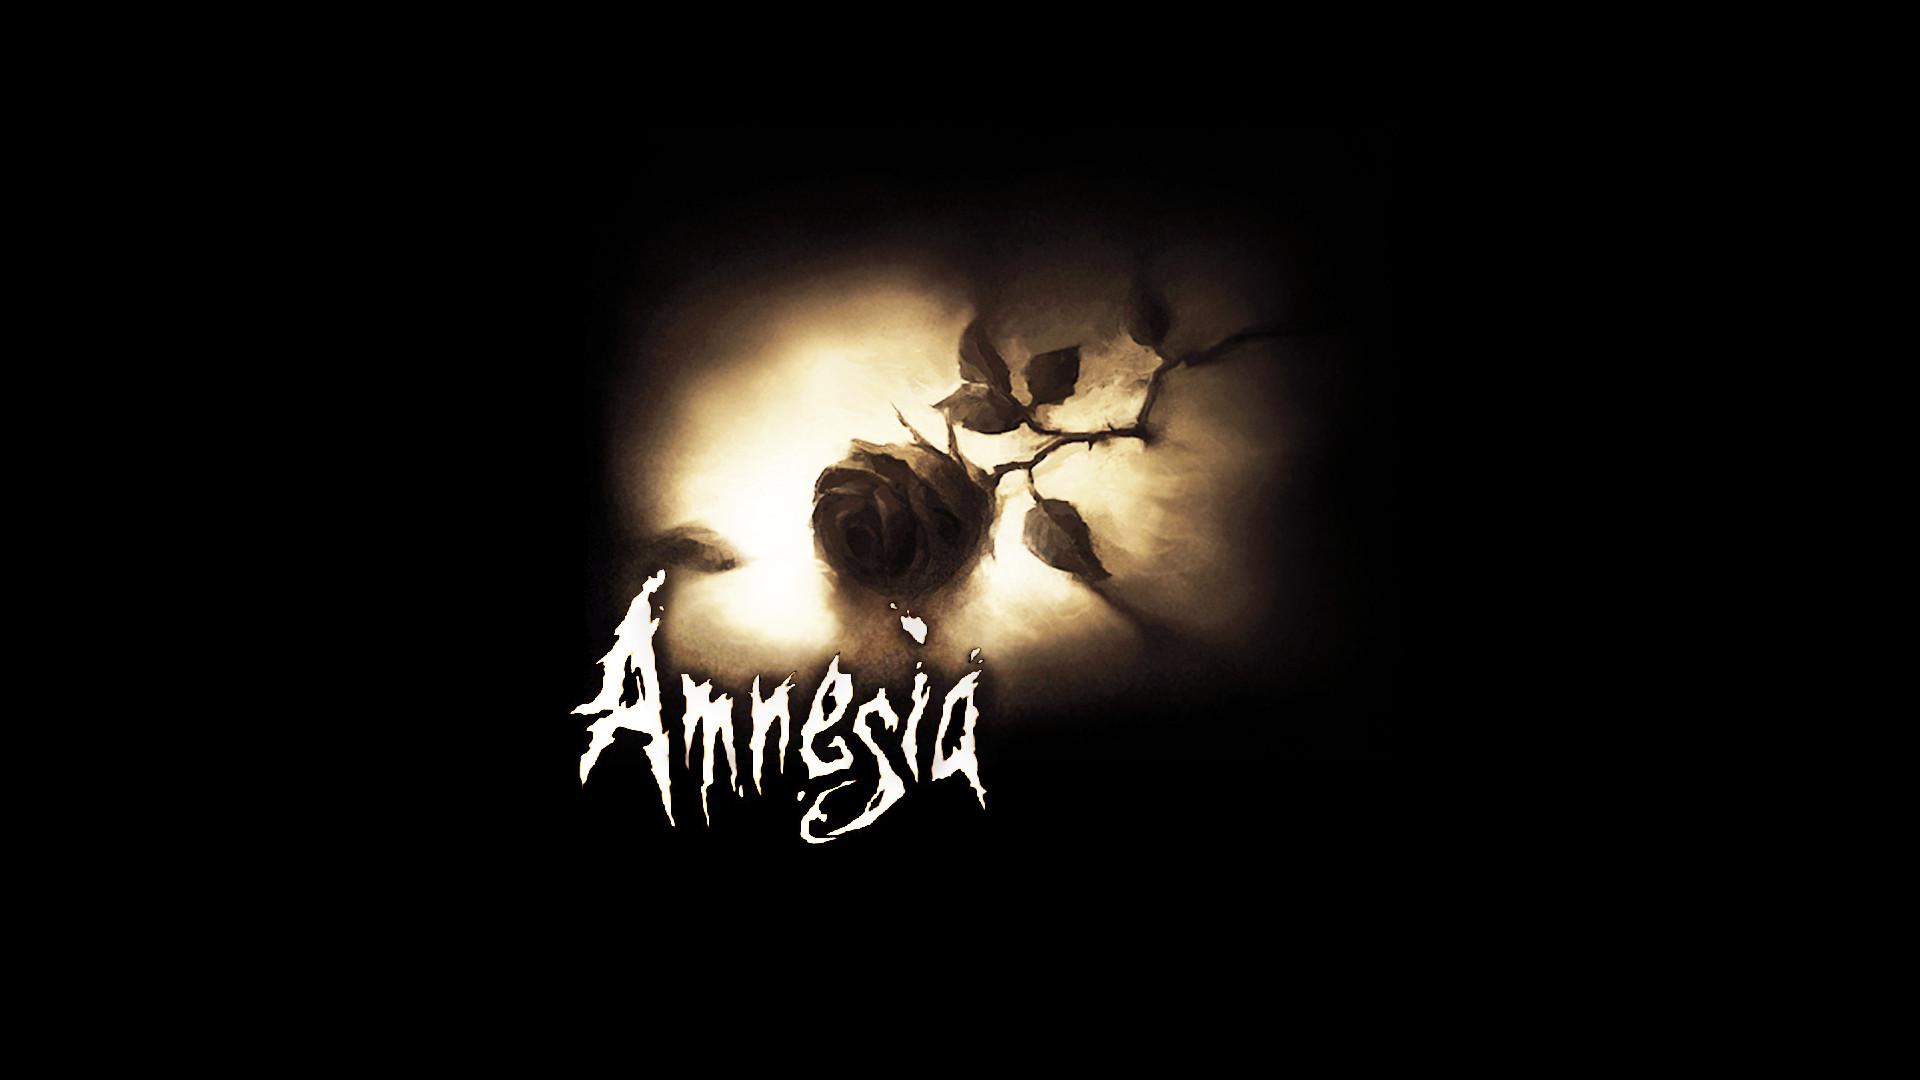 Free Download Amnesia The Dark Descent Wallpaper 86 Images